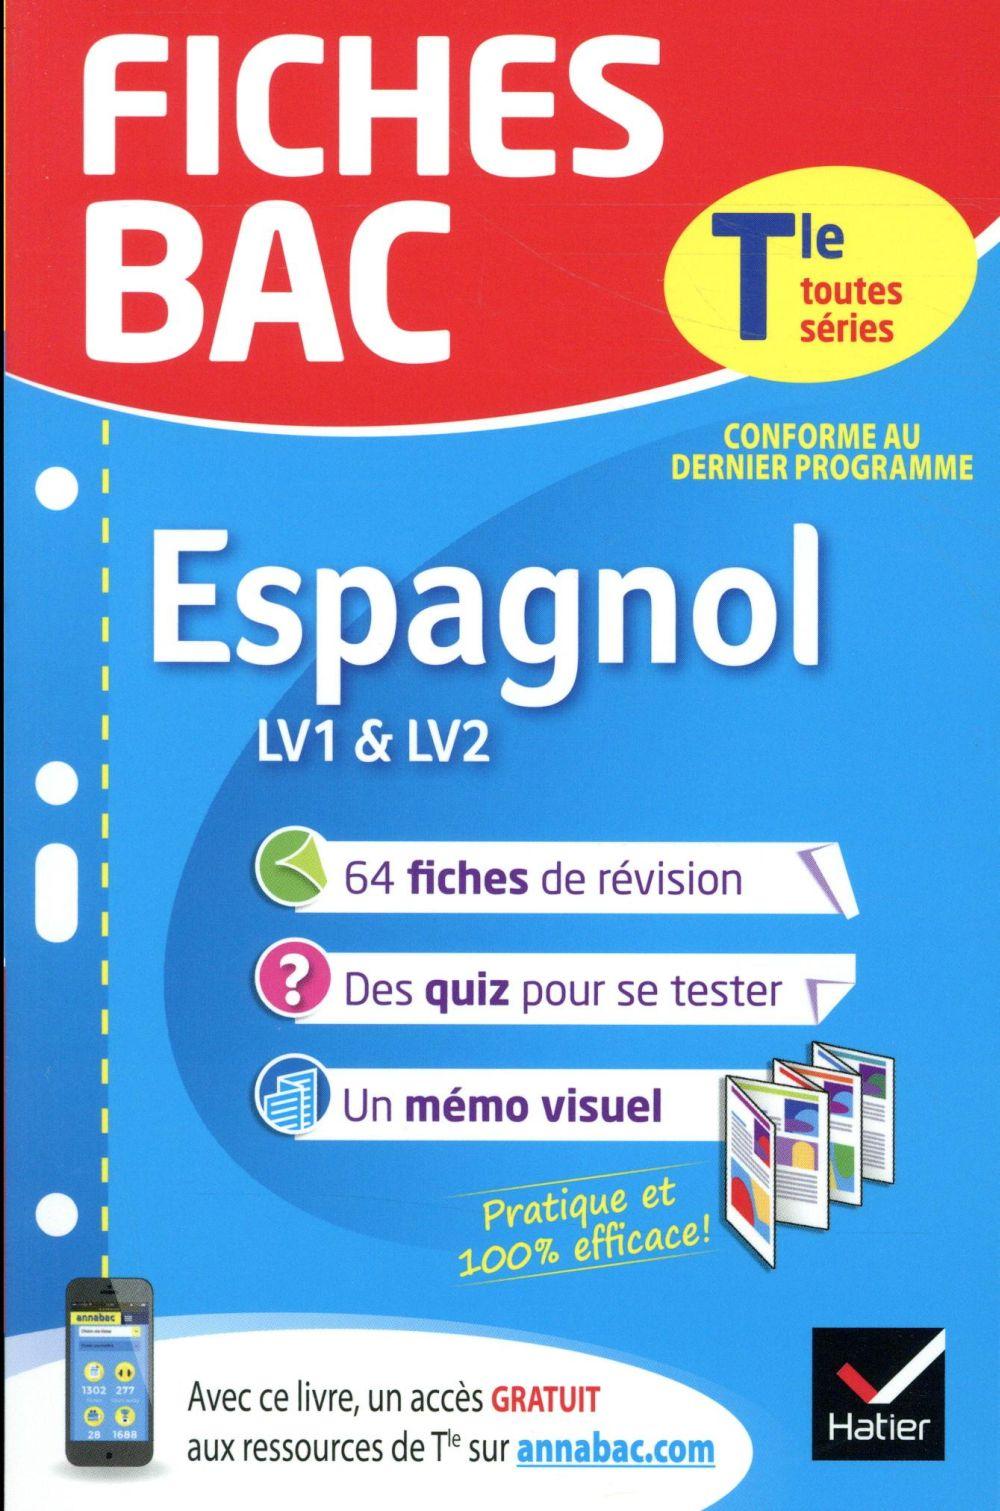 Fiches Bac Espagnol Terminale Lv1 Lv2 Jean Congar Hatier Poche Actes Sud Au Mejan Arles